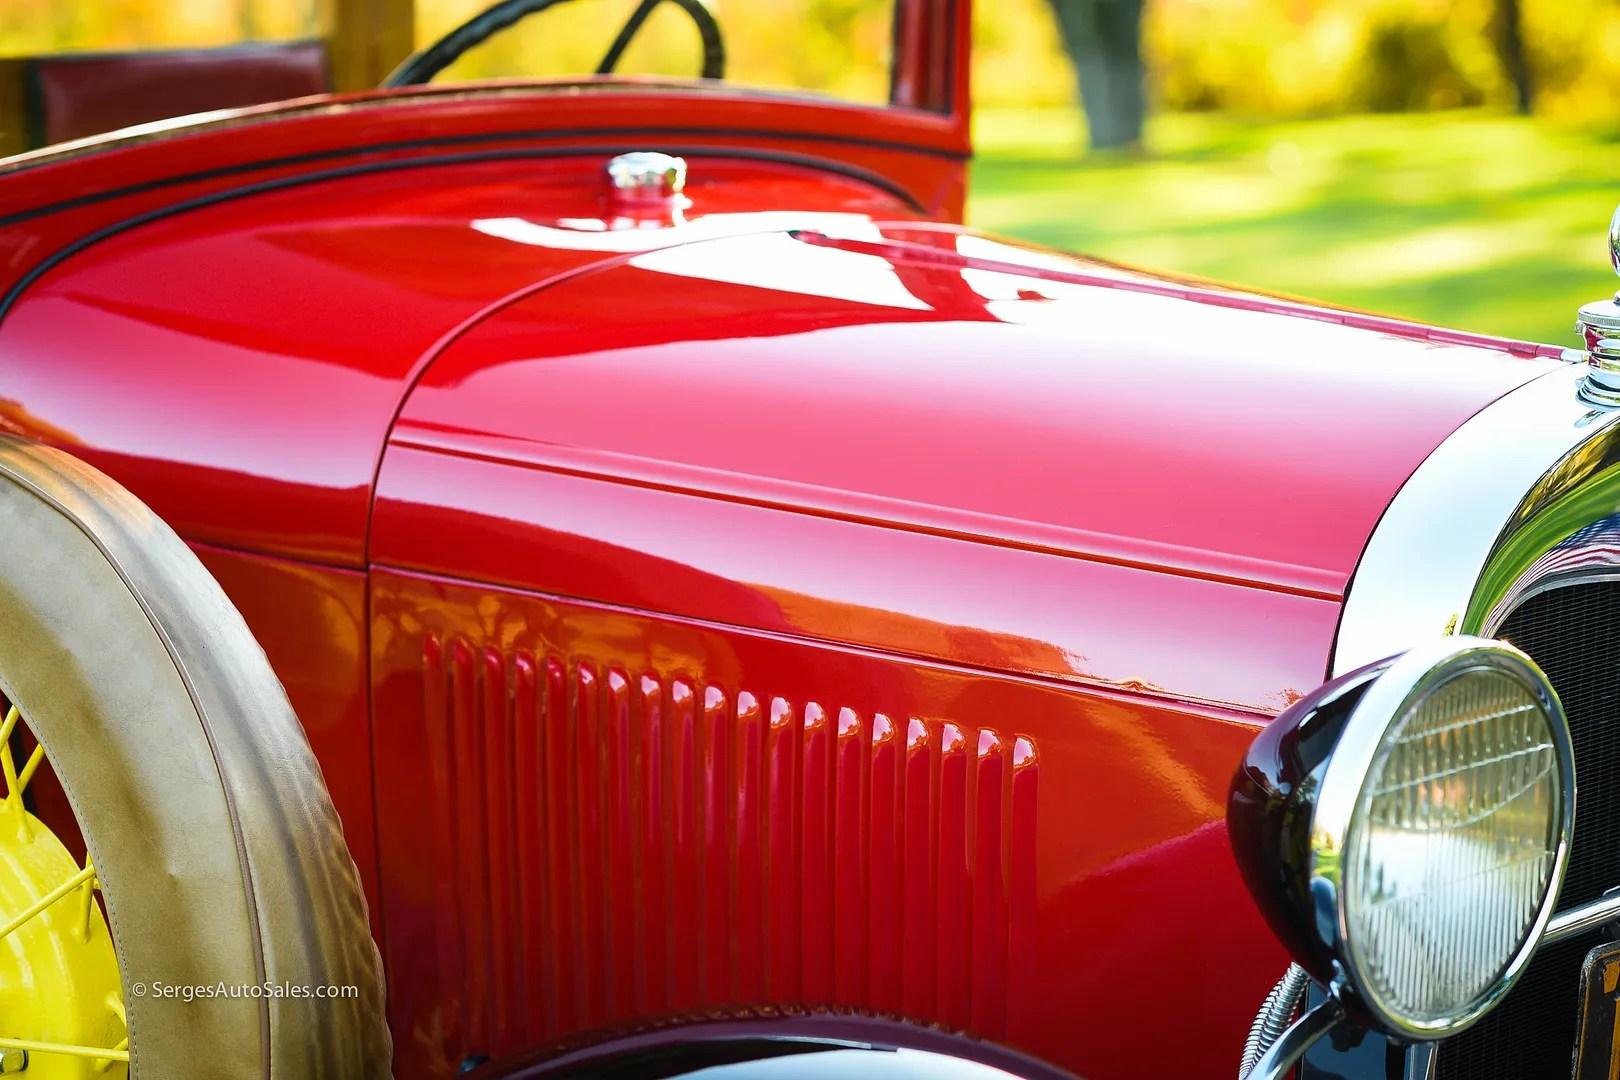 photo 1929-Ford-Model-A-Huckster-for-sale-serges-auto-sales-northeast-pennsylvania-scranton-muscle-cars-corvettes--21_zps16gj6ojc.jpg